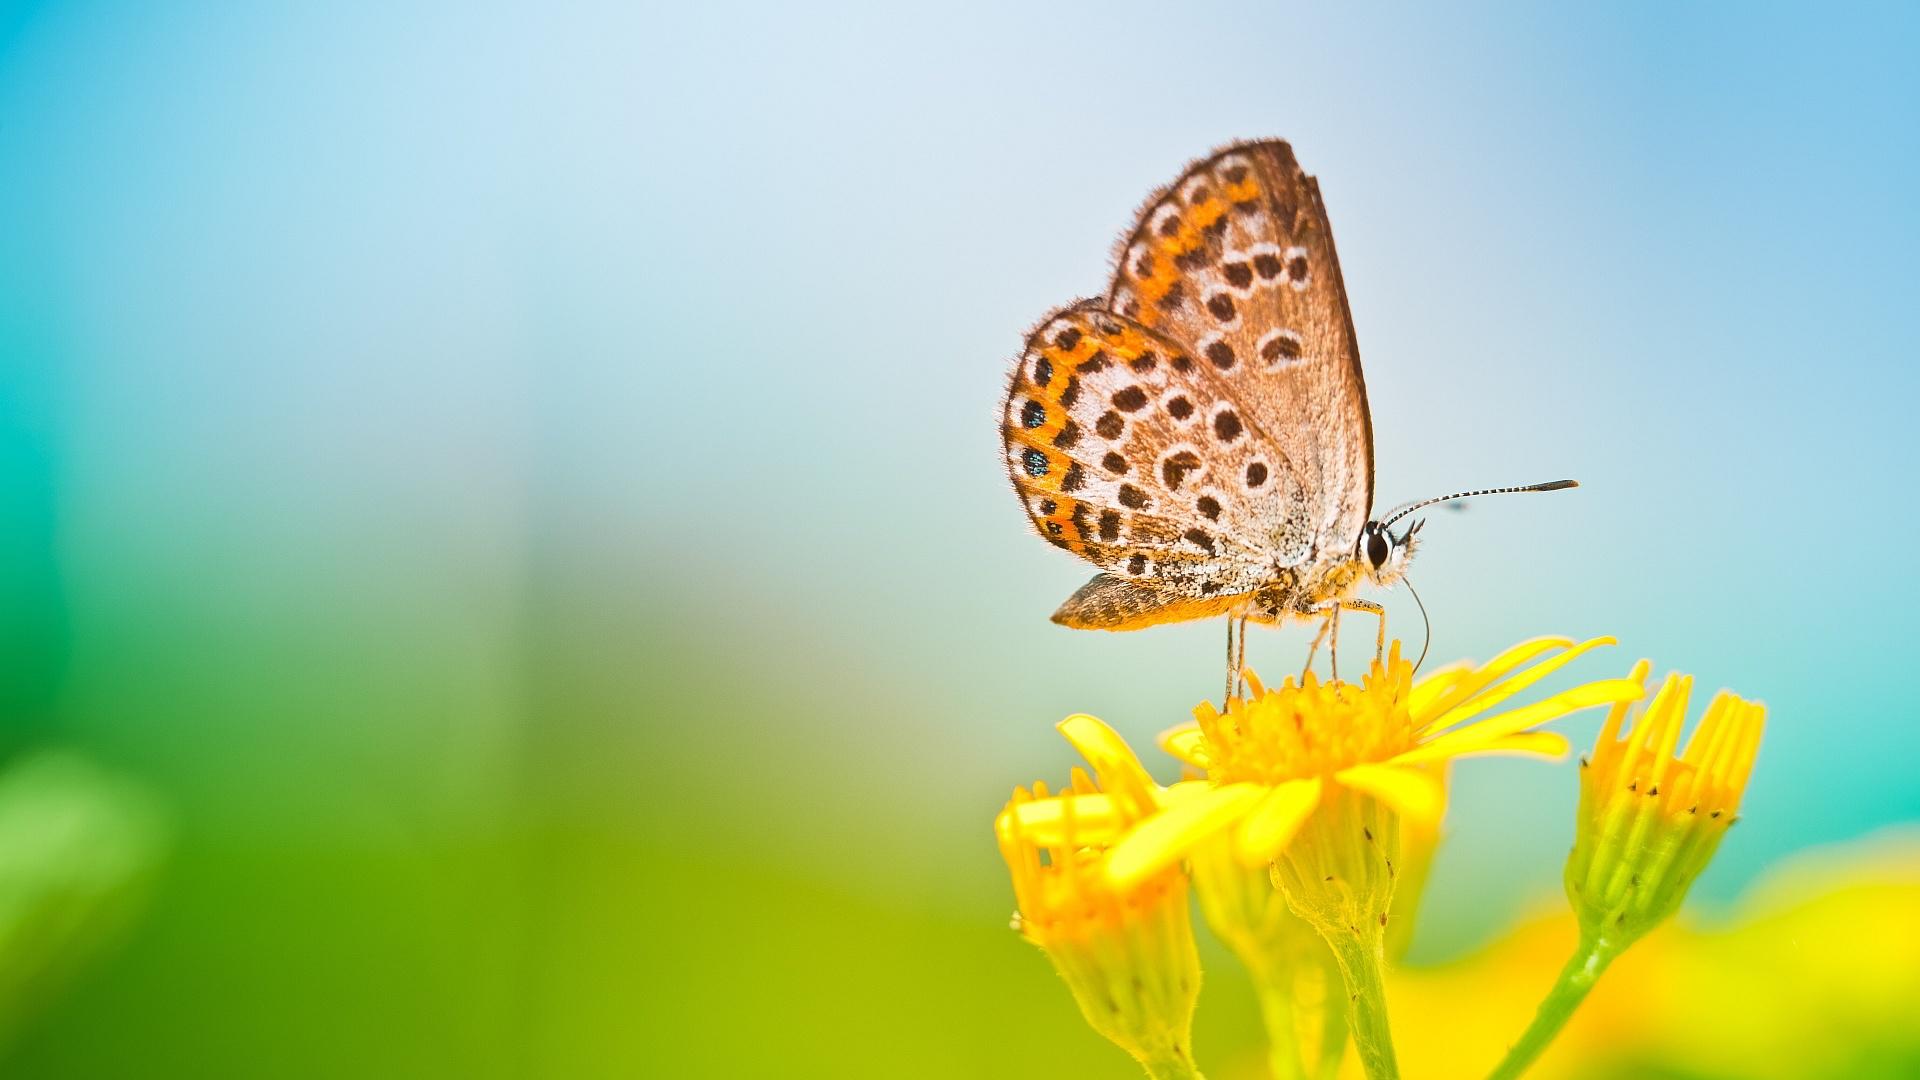 Primavera borboleta, flor amarela, fundo borrado Papéis de Parede ... Yellow